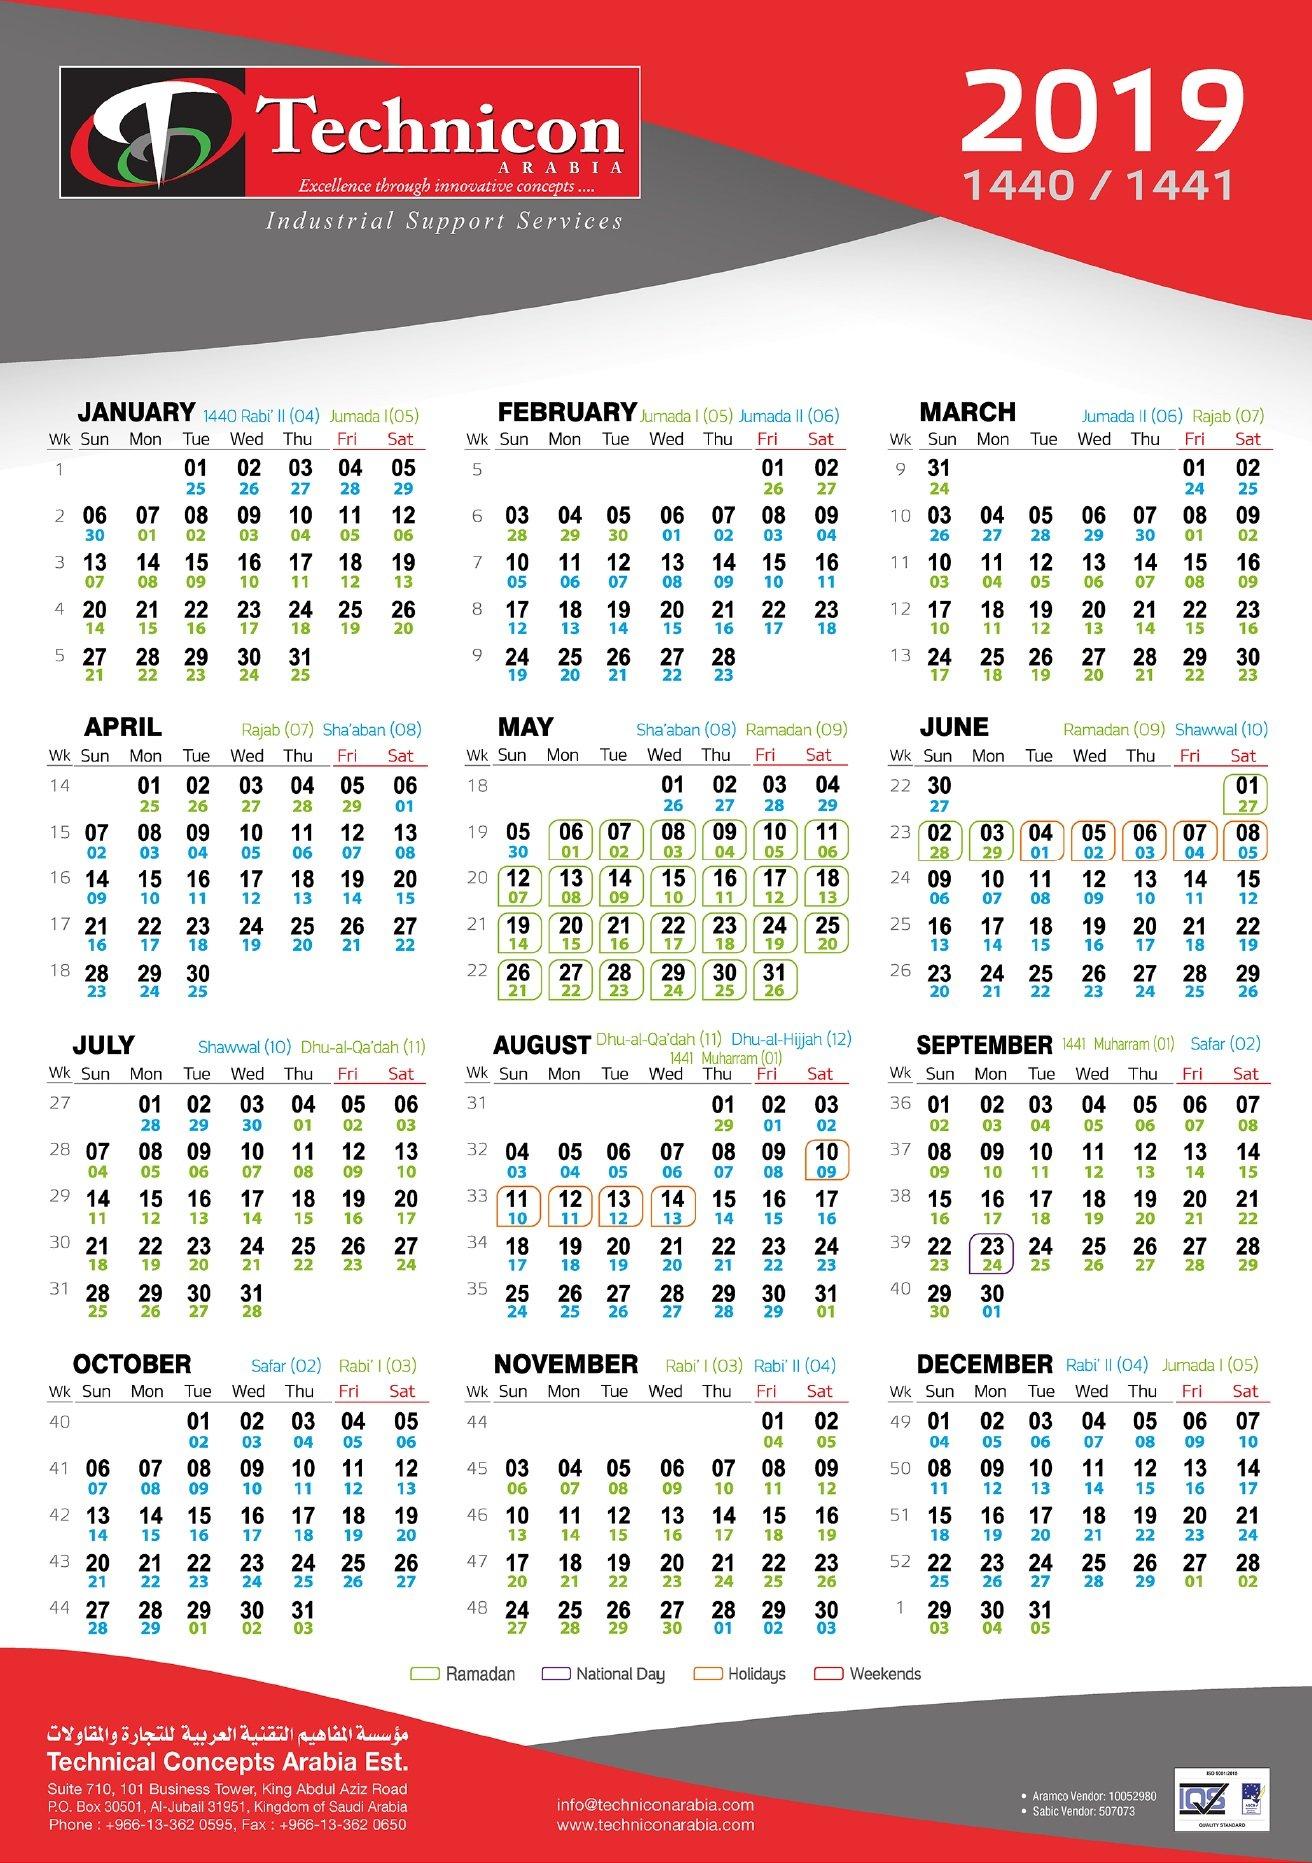 Calendar 2019 – Technicon Arabia Calendar 2019 Ksa